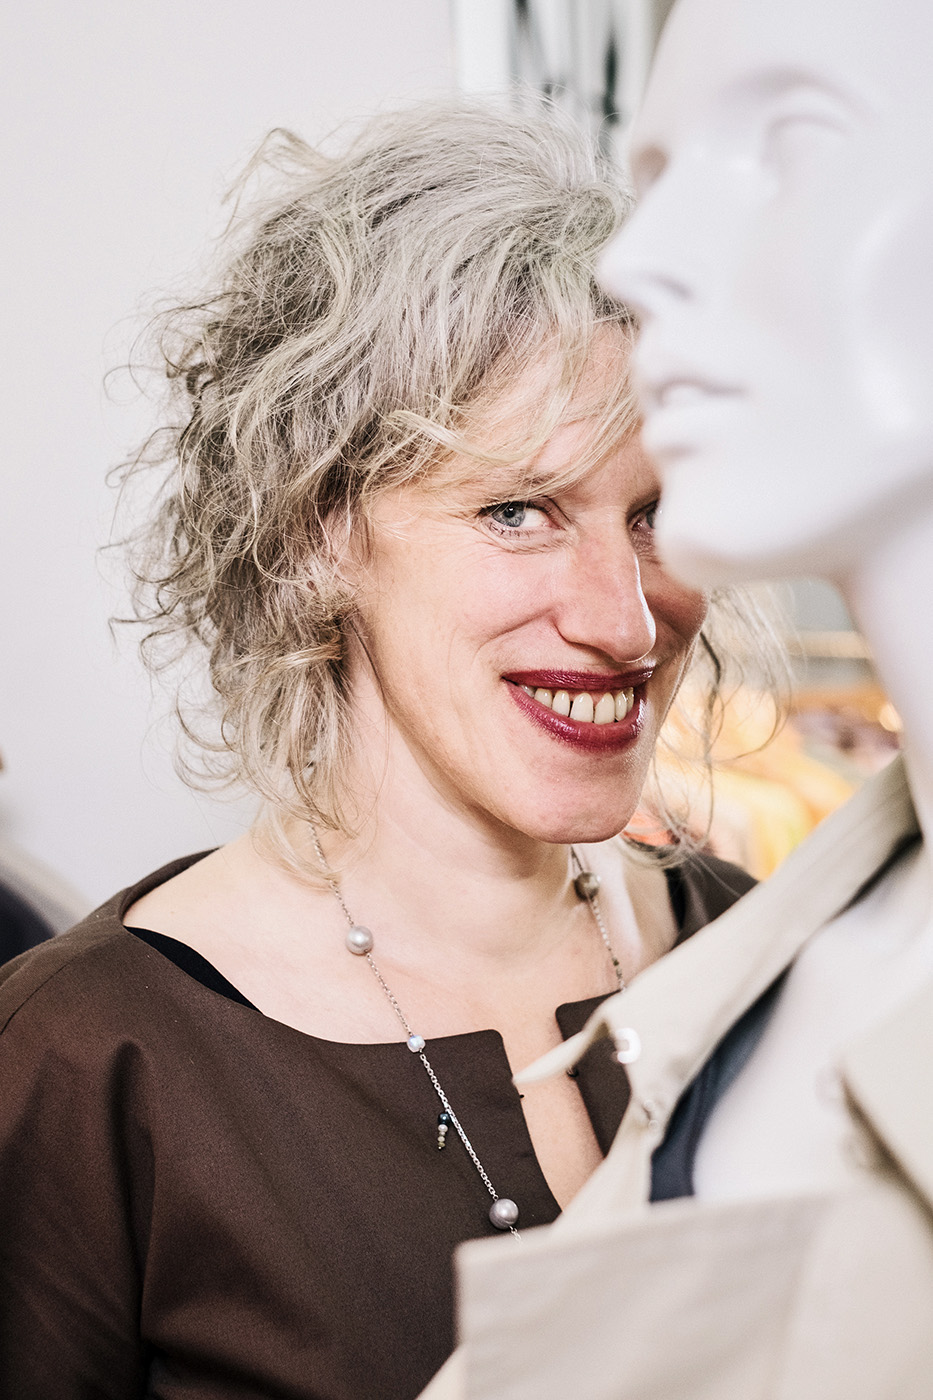 Ruth Löffelholz, Modedesignerin